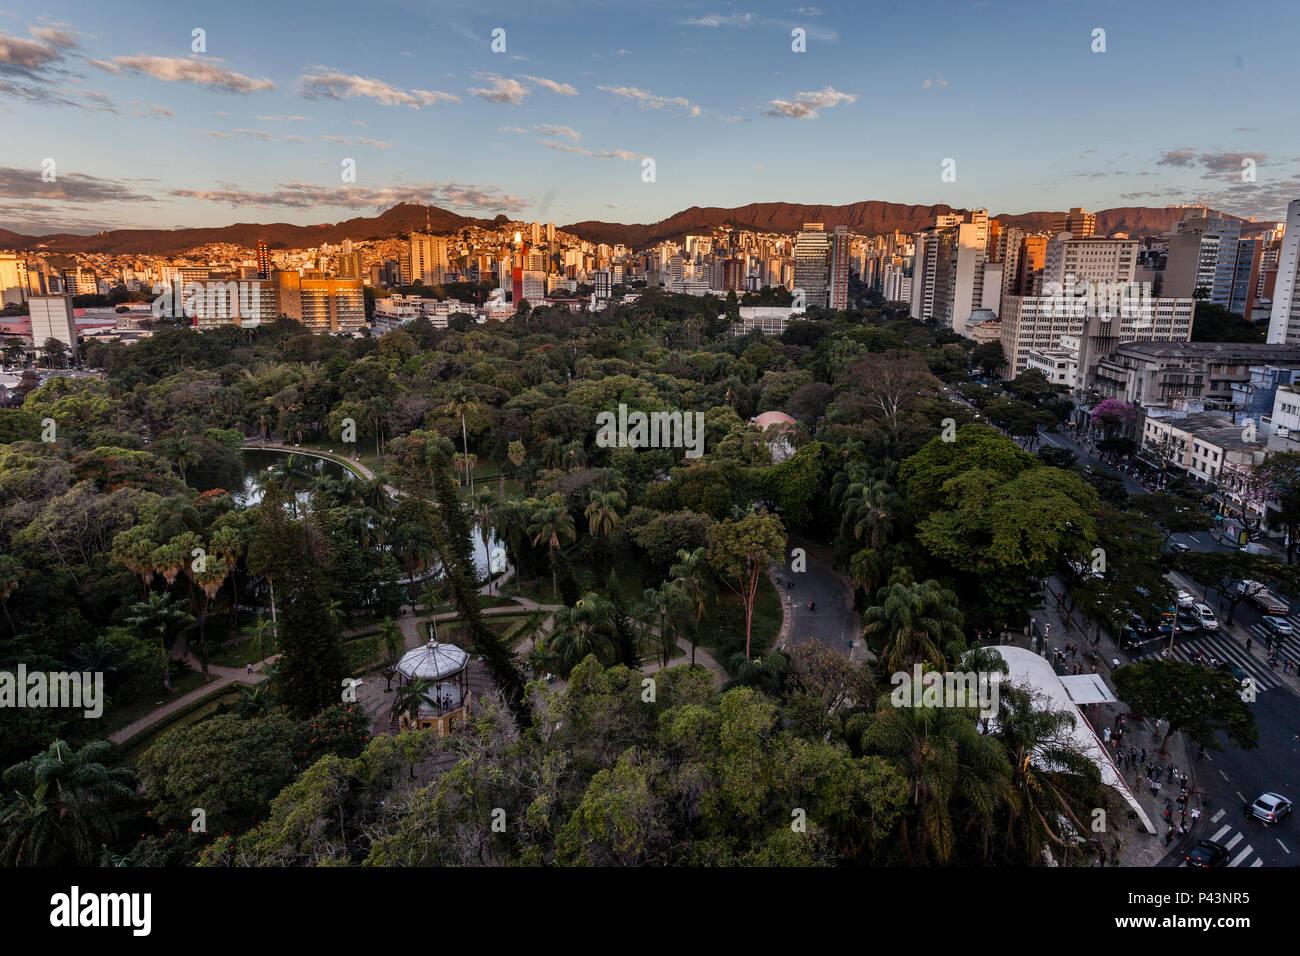 Parque Municipal Américo Renné Giannetti, Belo Horizonte / MG - Brasil. foto: Nereu JR / Fotoarena Immagini Stock